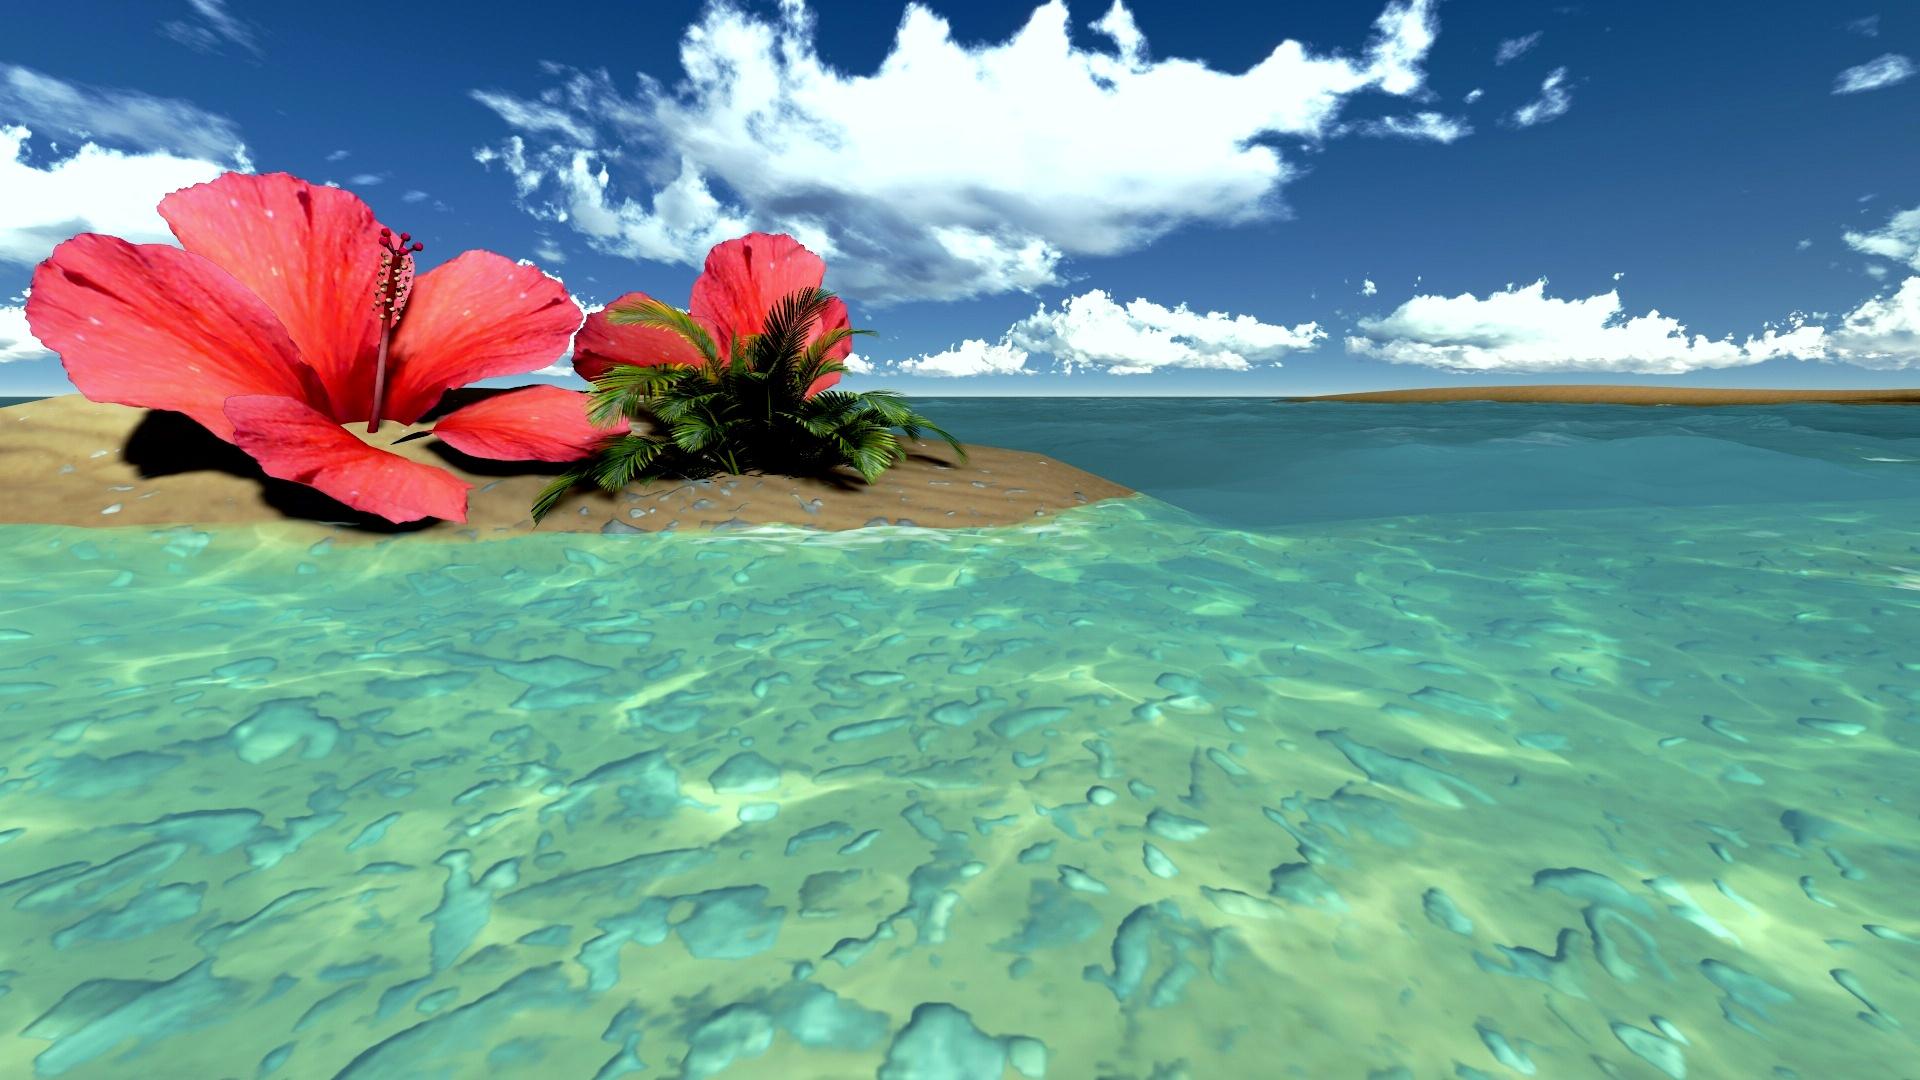 Tropical Free Beach Backgrounds - HD Wallpaper